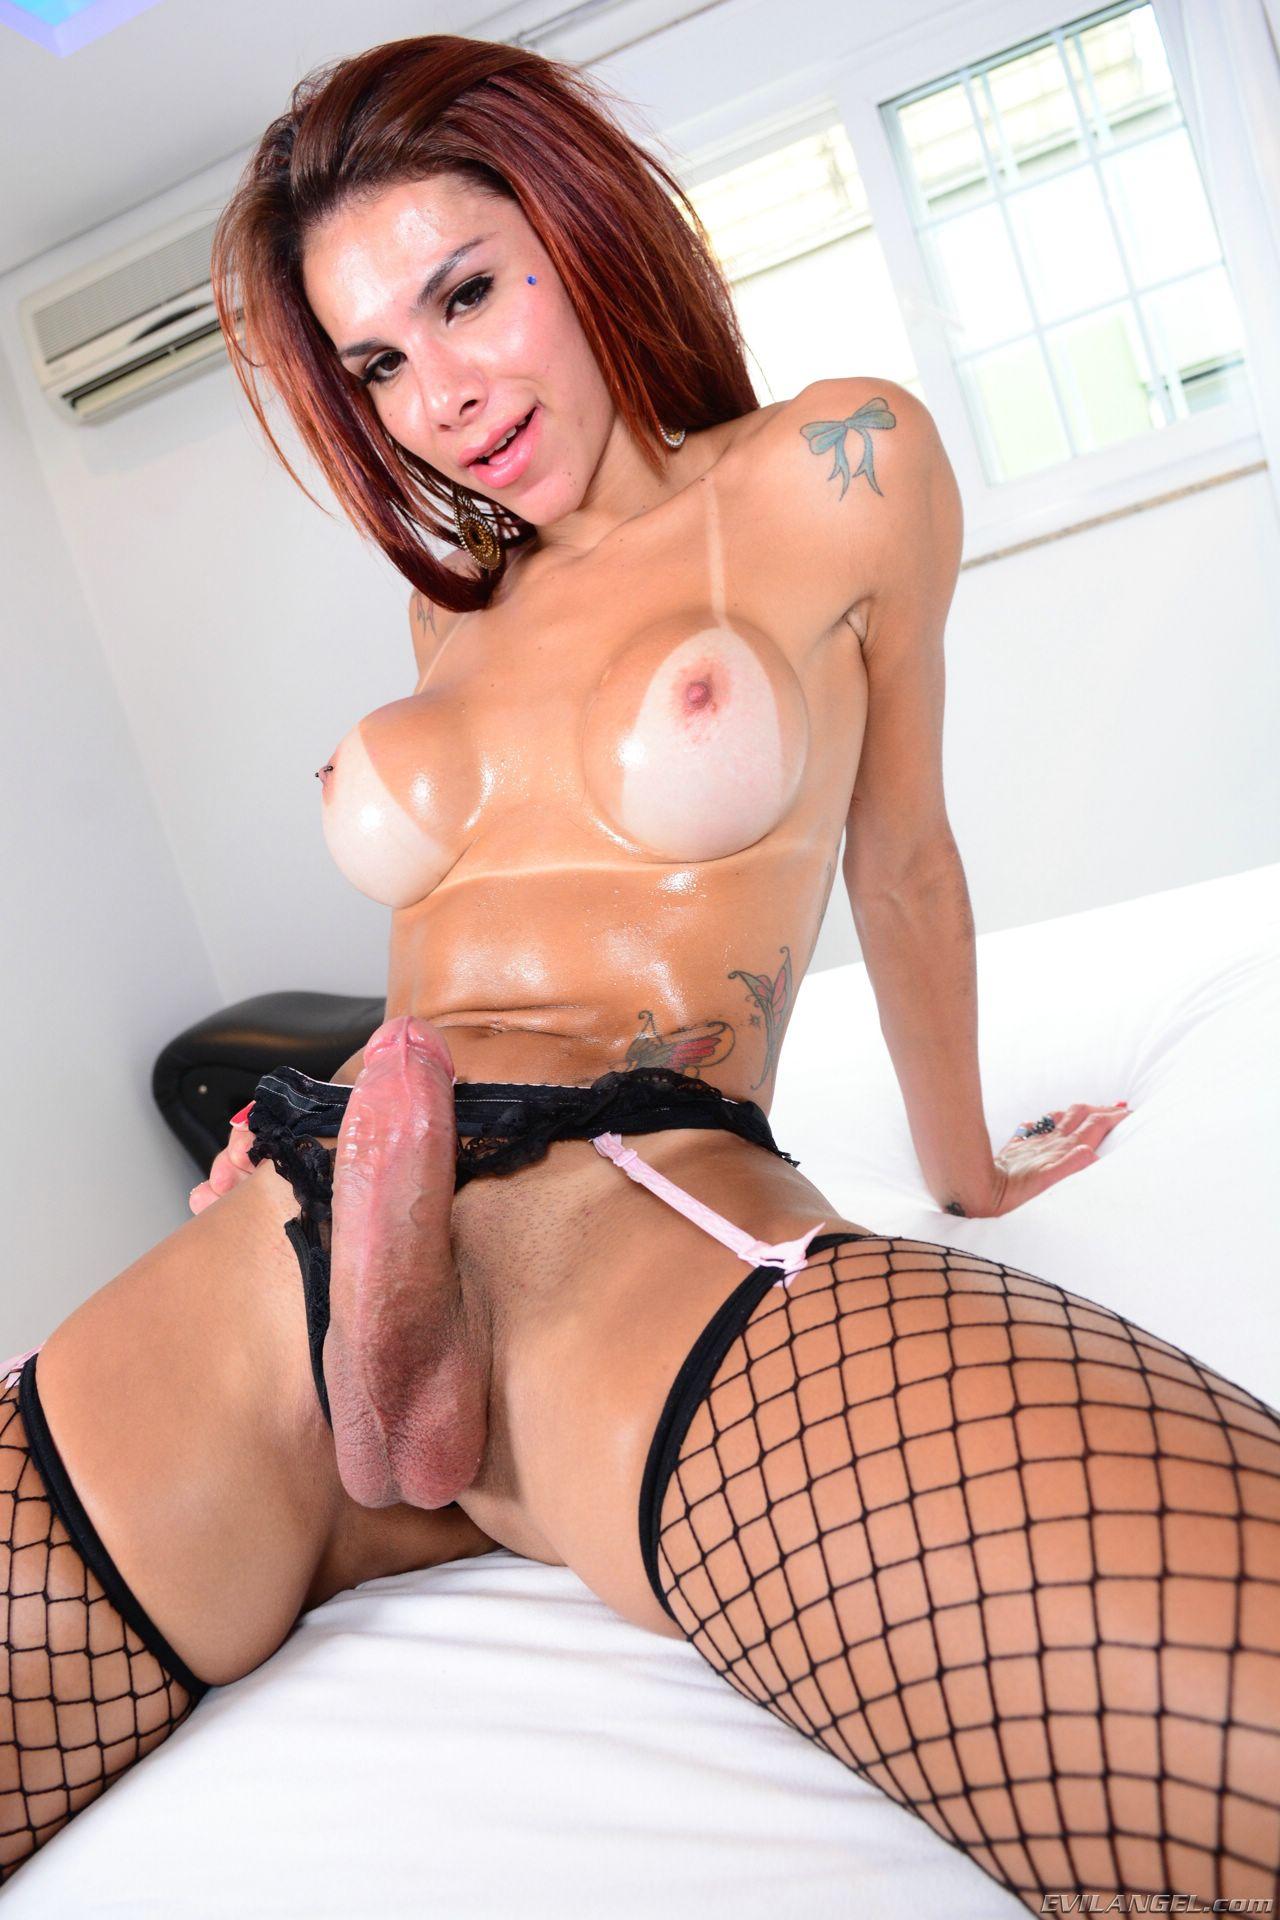 Her entire body christine cock